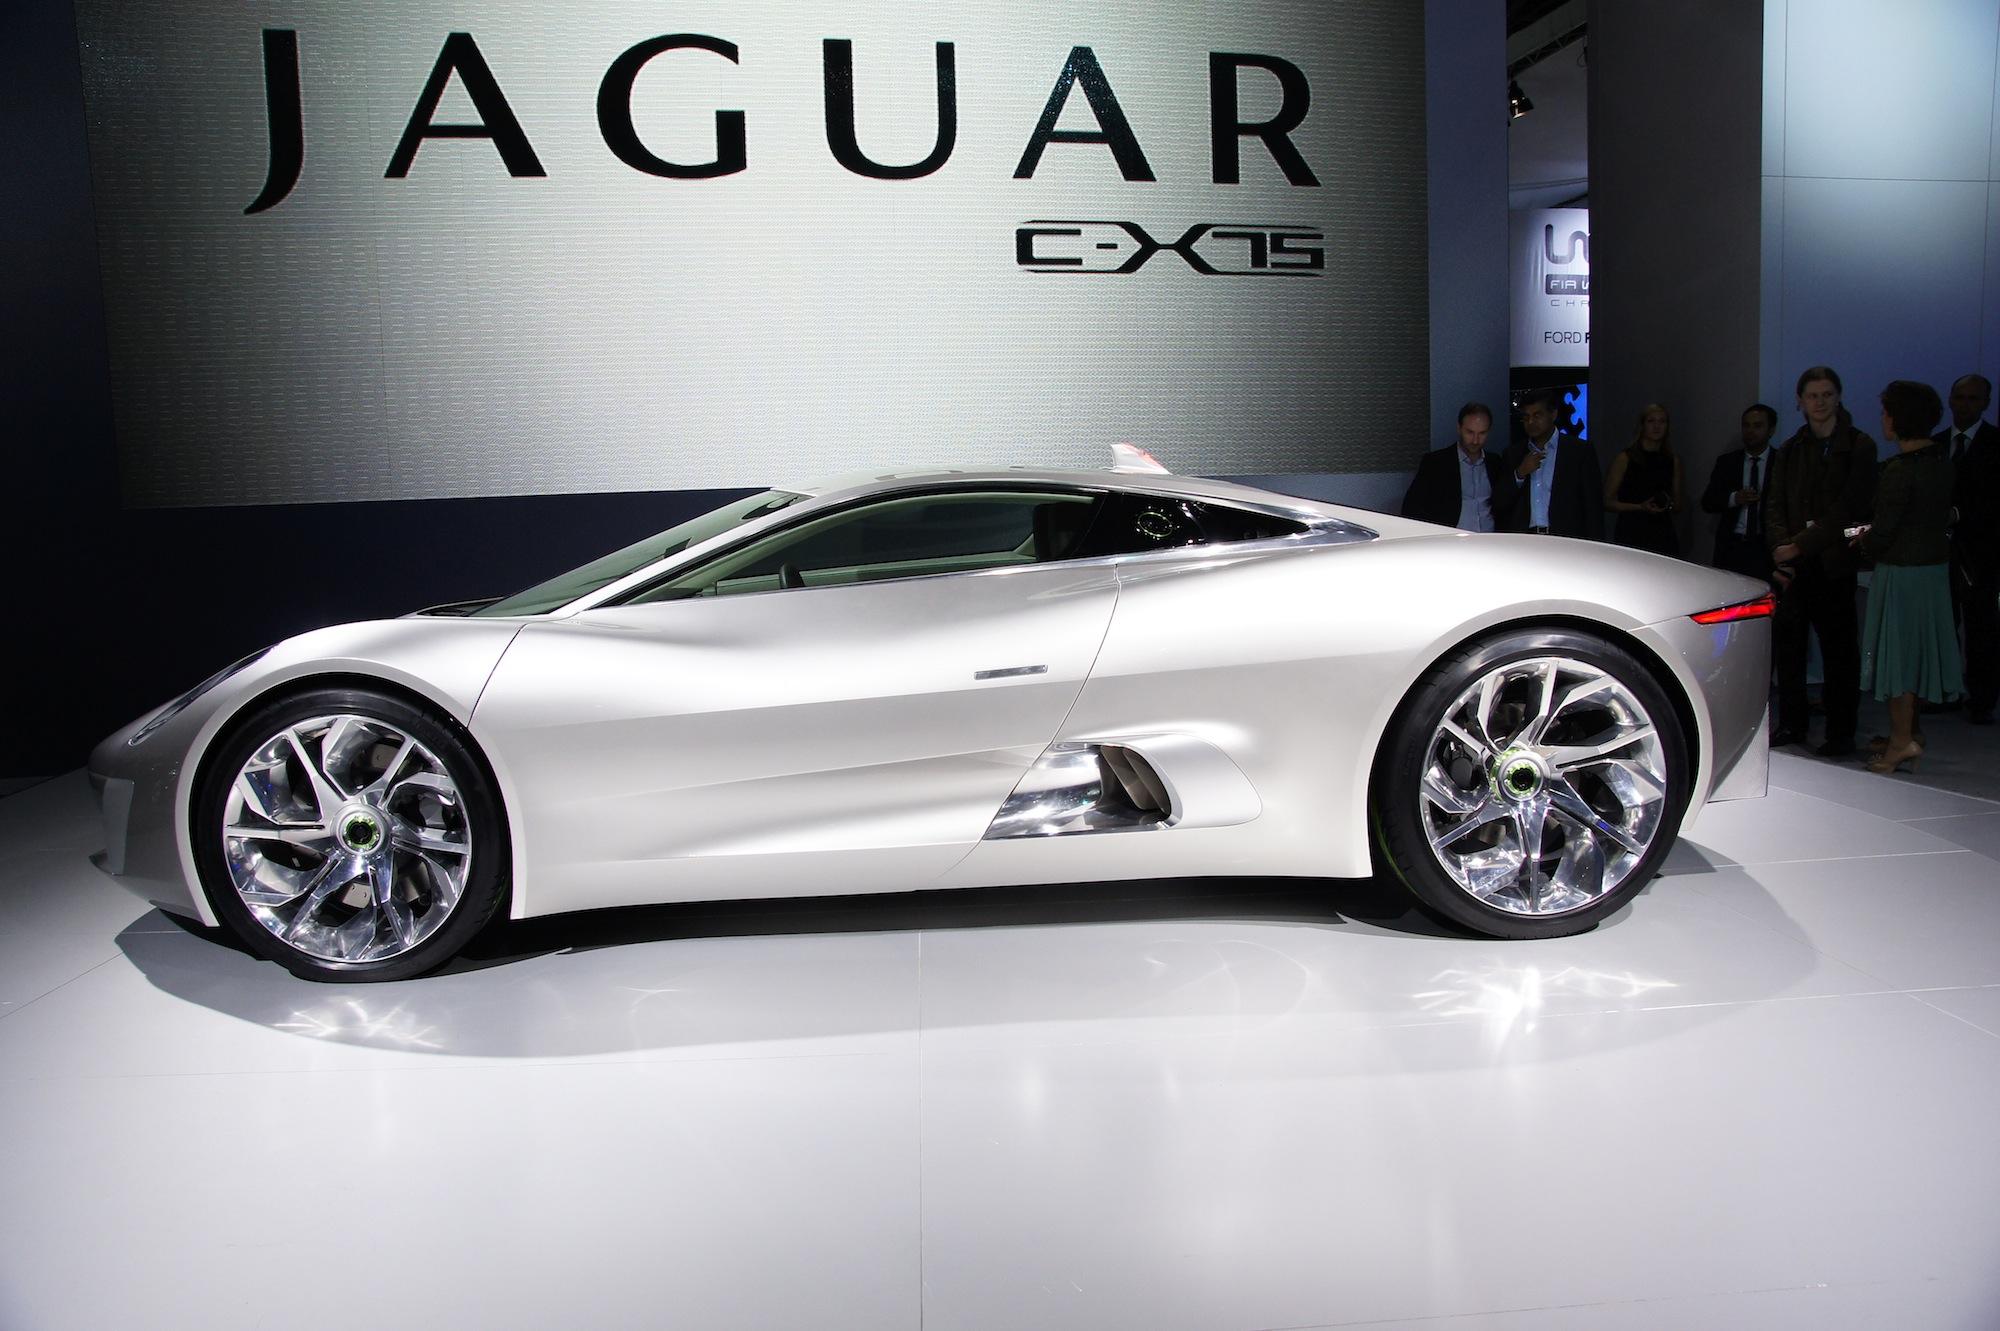 jaguar c x75 hybrid supercar on verge of testing phase photos caradvice. Black Bedroom Furniture Sets. Home Design Ideas